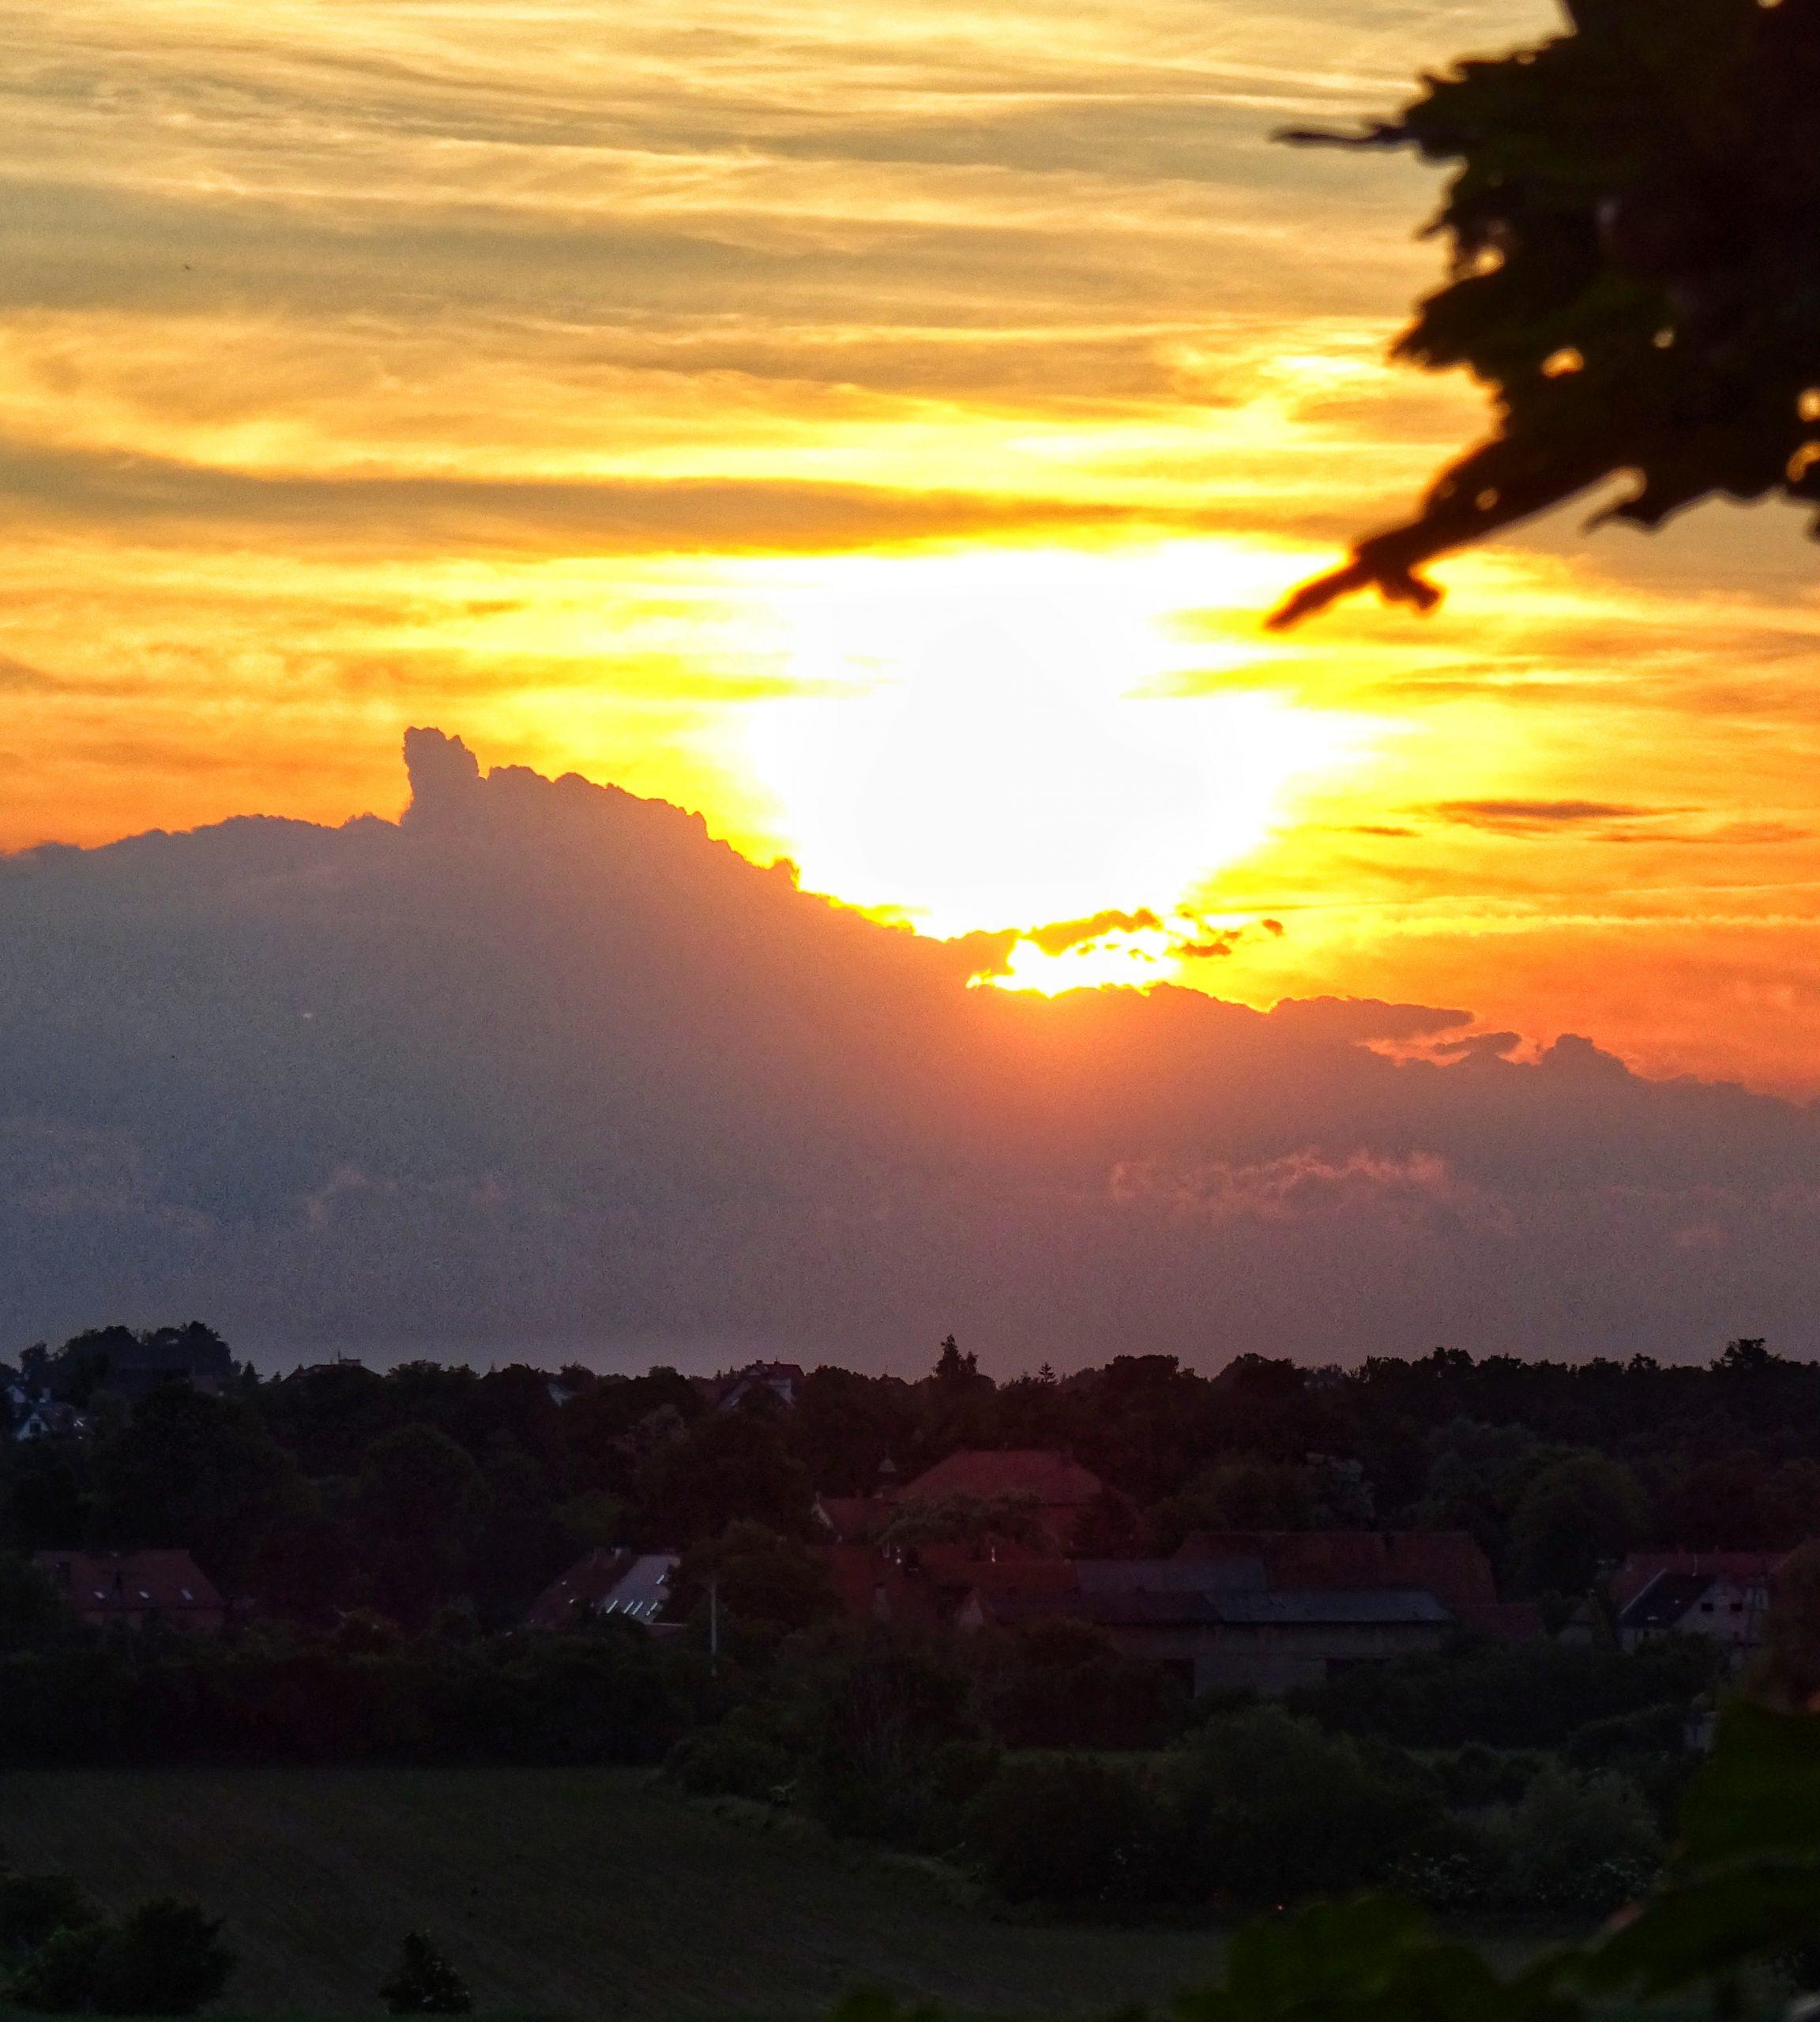 Zachód słońca nad Kraszowicami. Fot. Leszek Krawiec